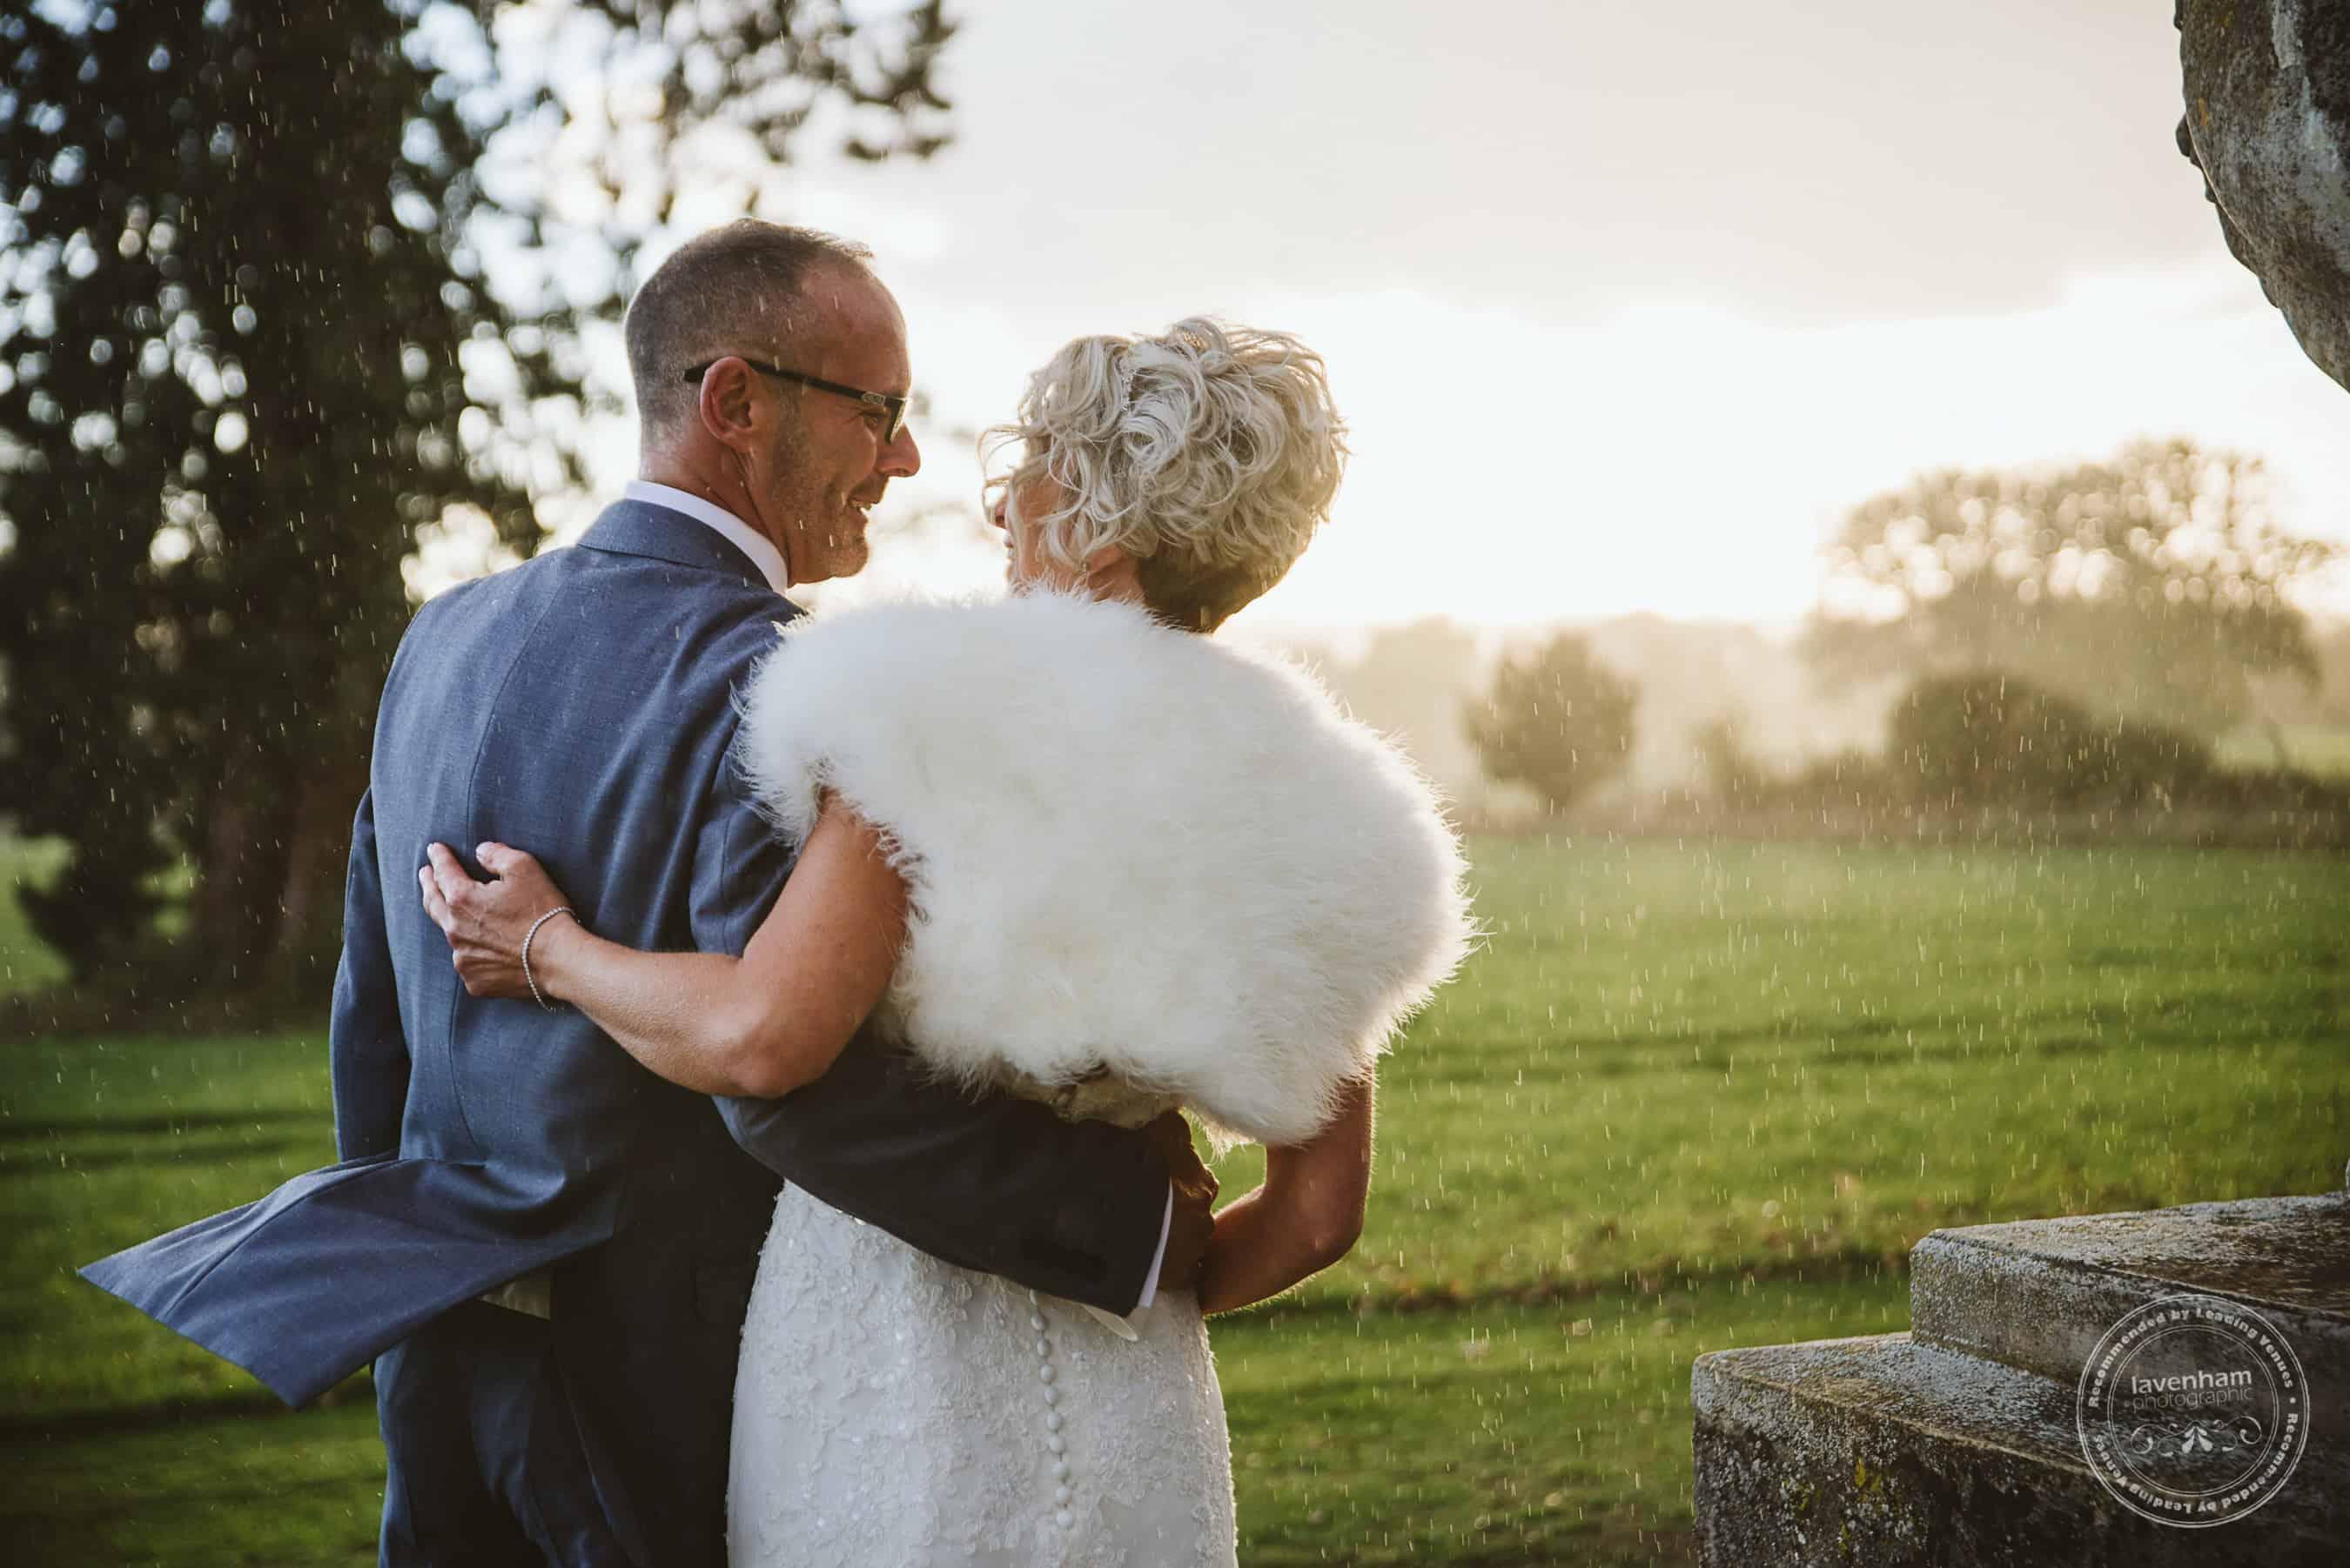 281018 Gosfield Hall Wedding Photography Lavenham Photographic 093